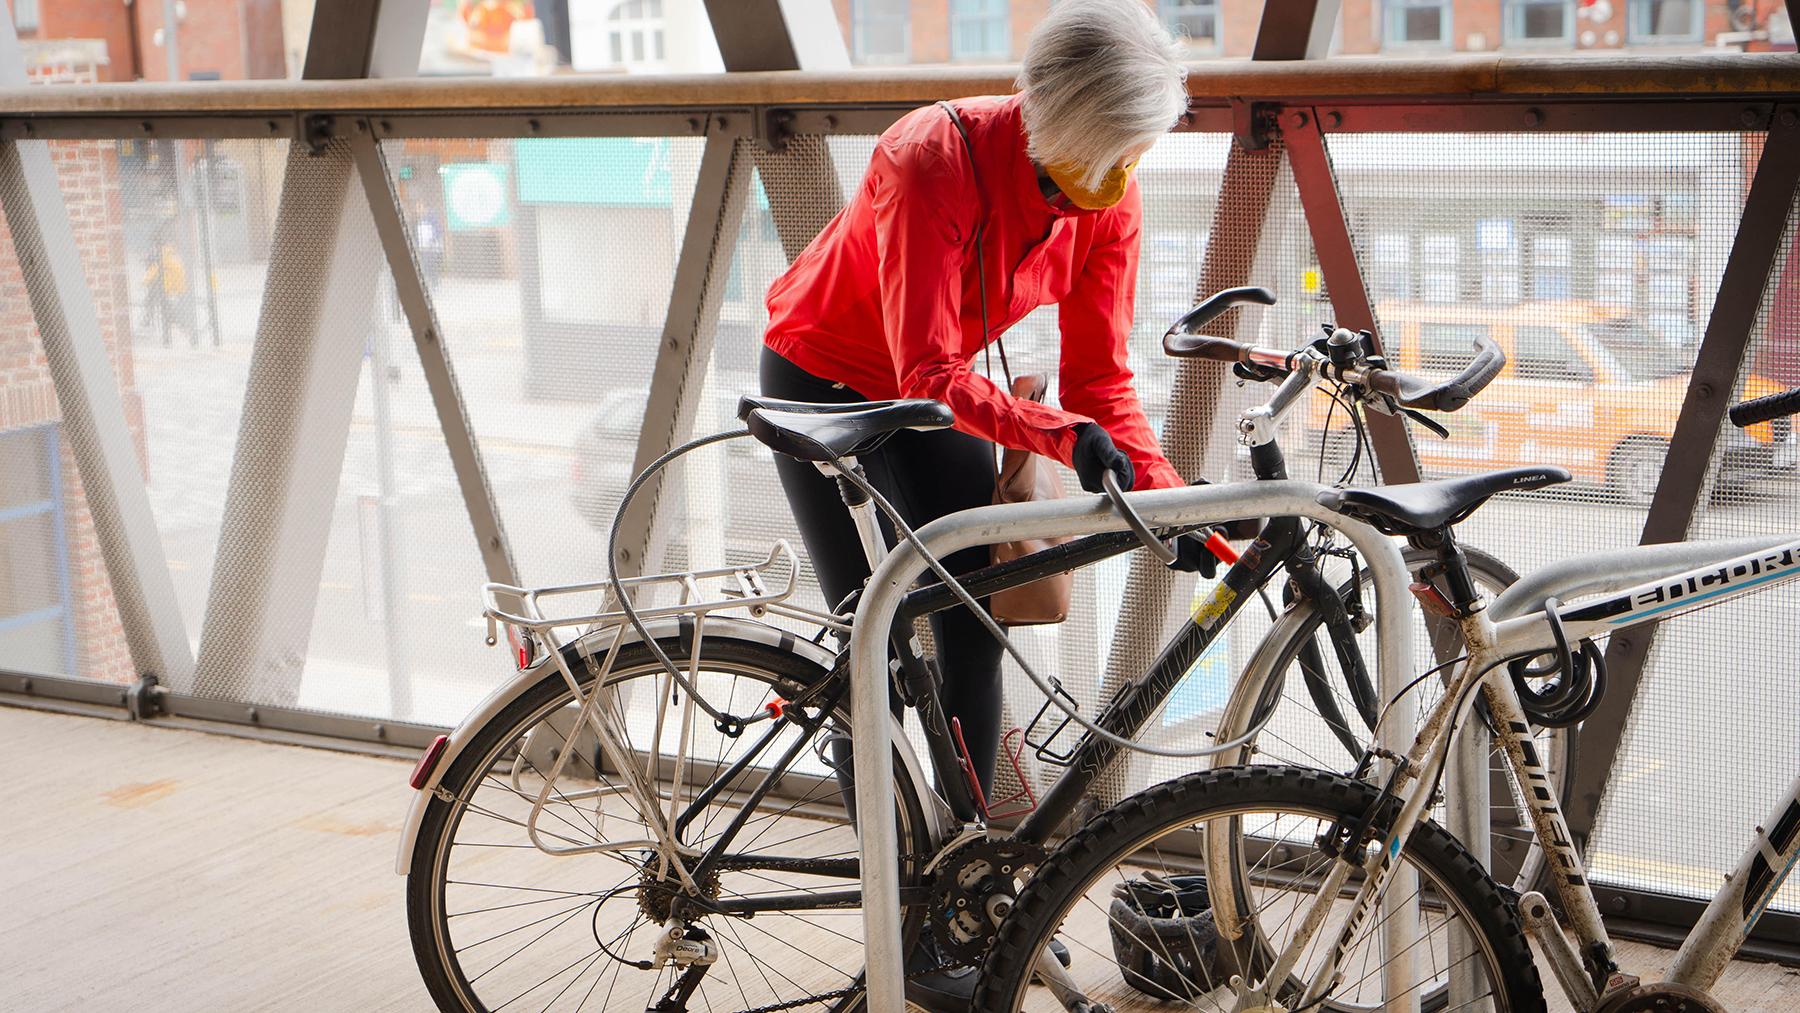 Sarah-Wigglesworth-Architects Kingston-Go-Cycle  SW and Bike Parking  1800x1013